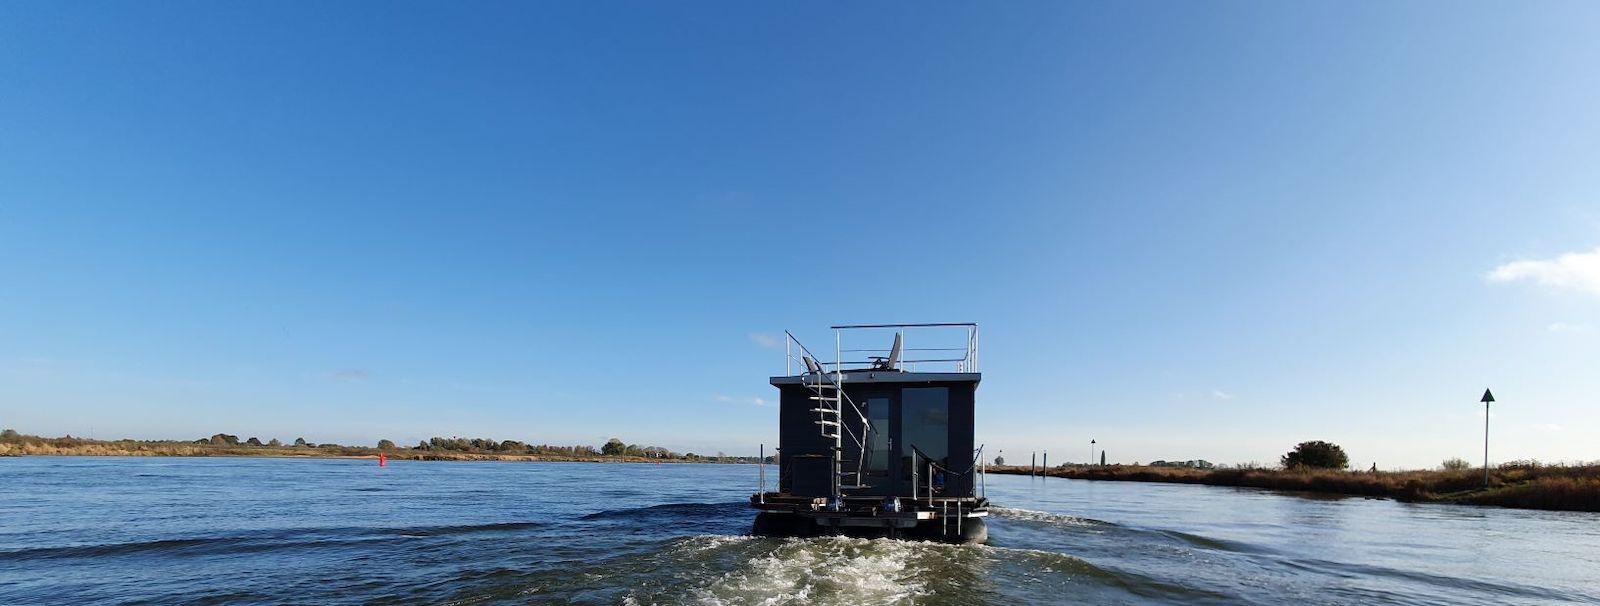 Supertrips - Otter Easy Houseboats